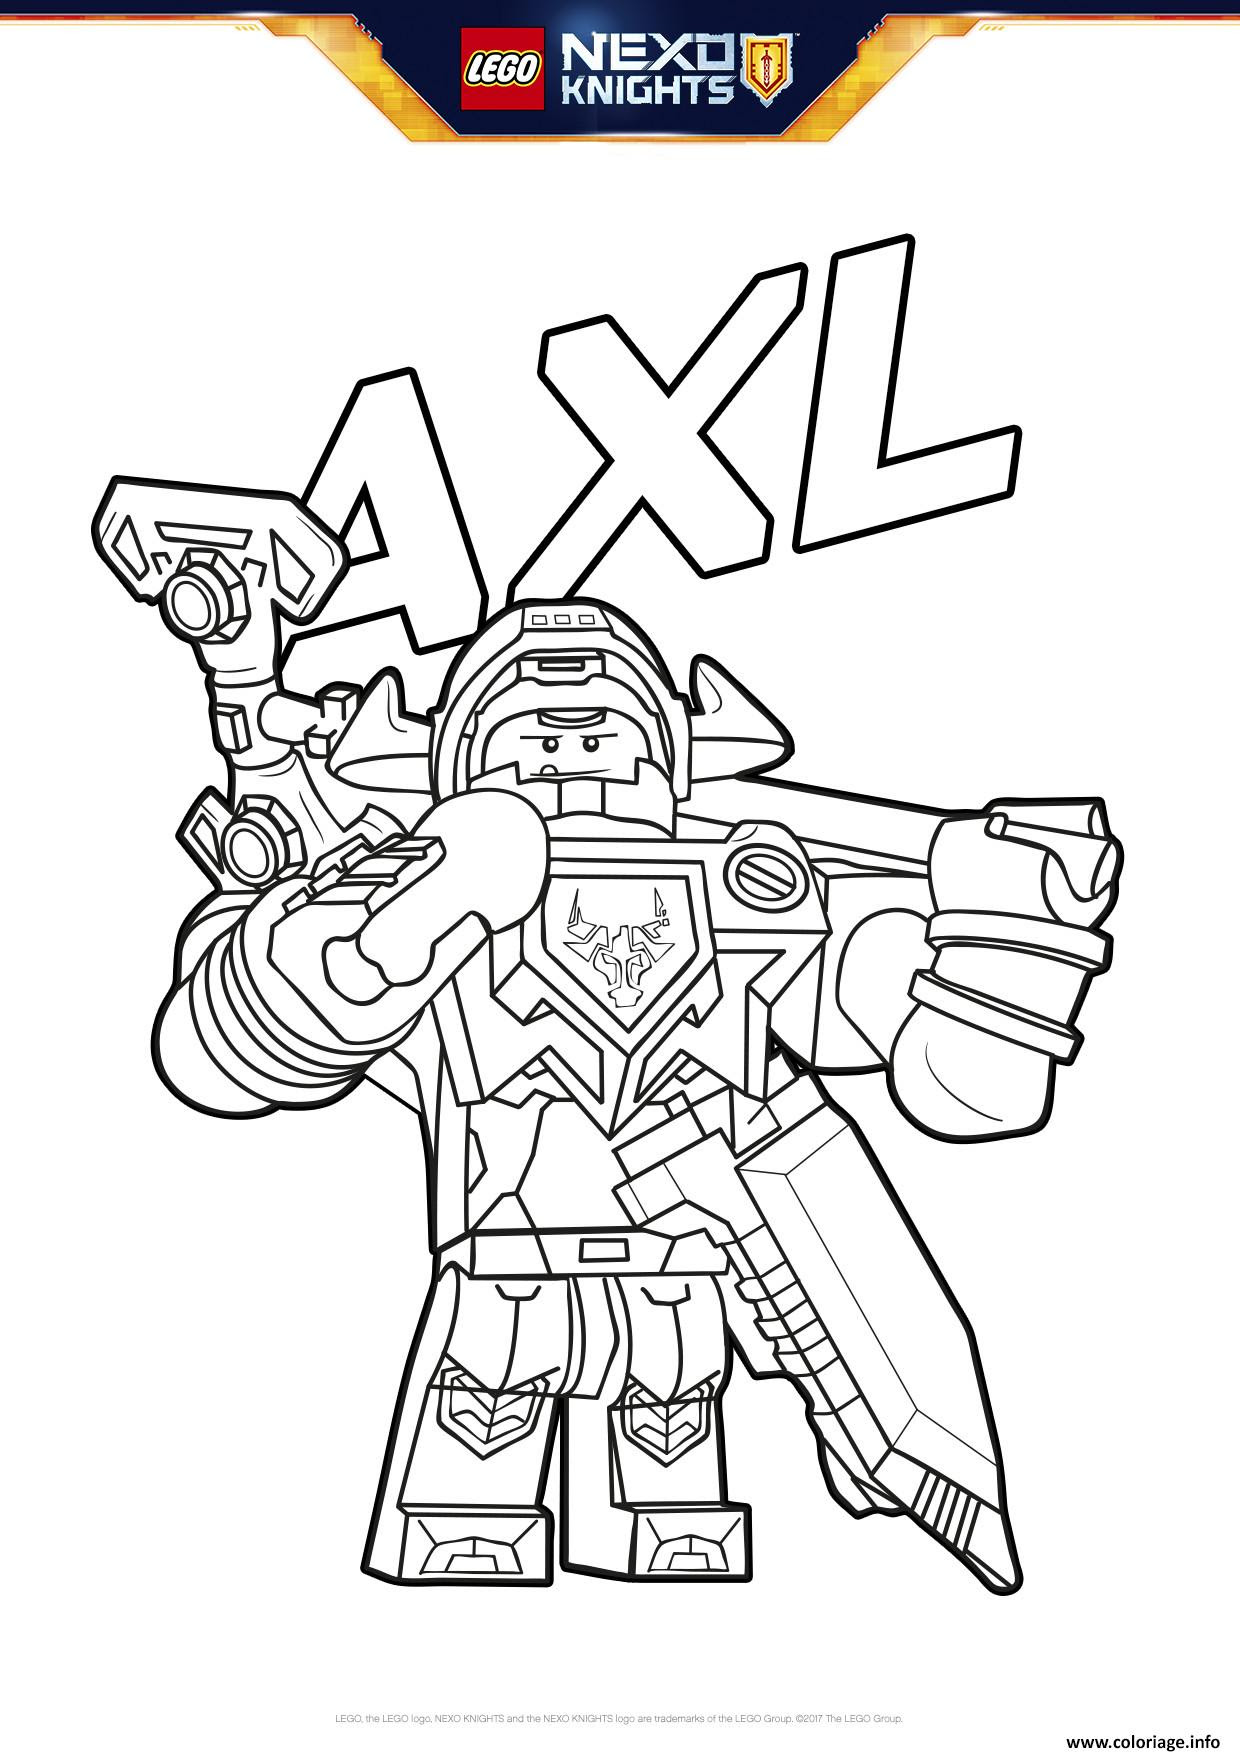 Coloriage Lego Nexo Knights Bouclier Axl Jecoloriecom